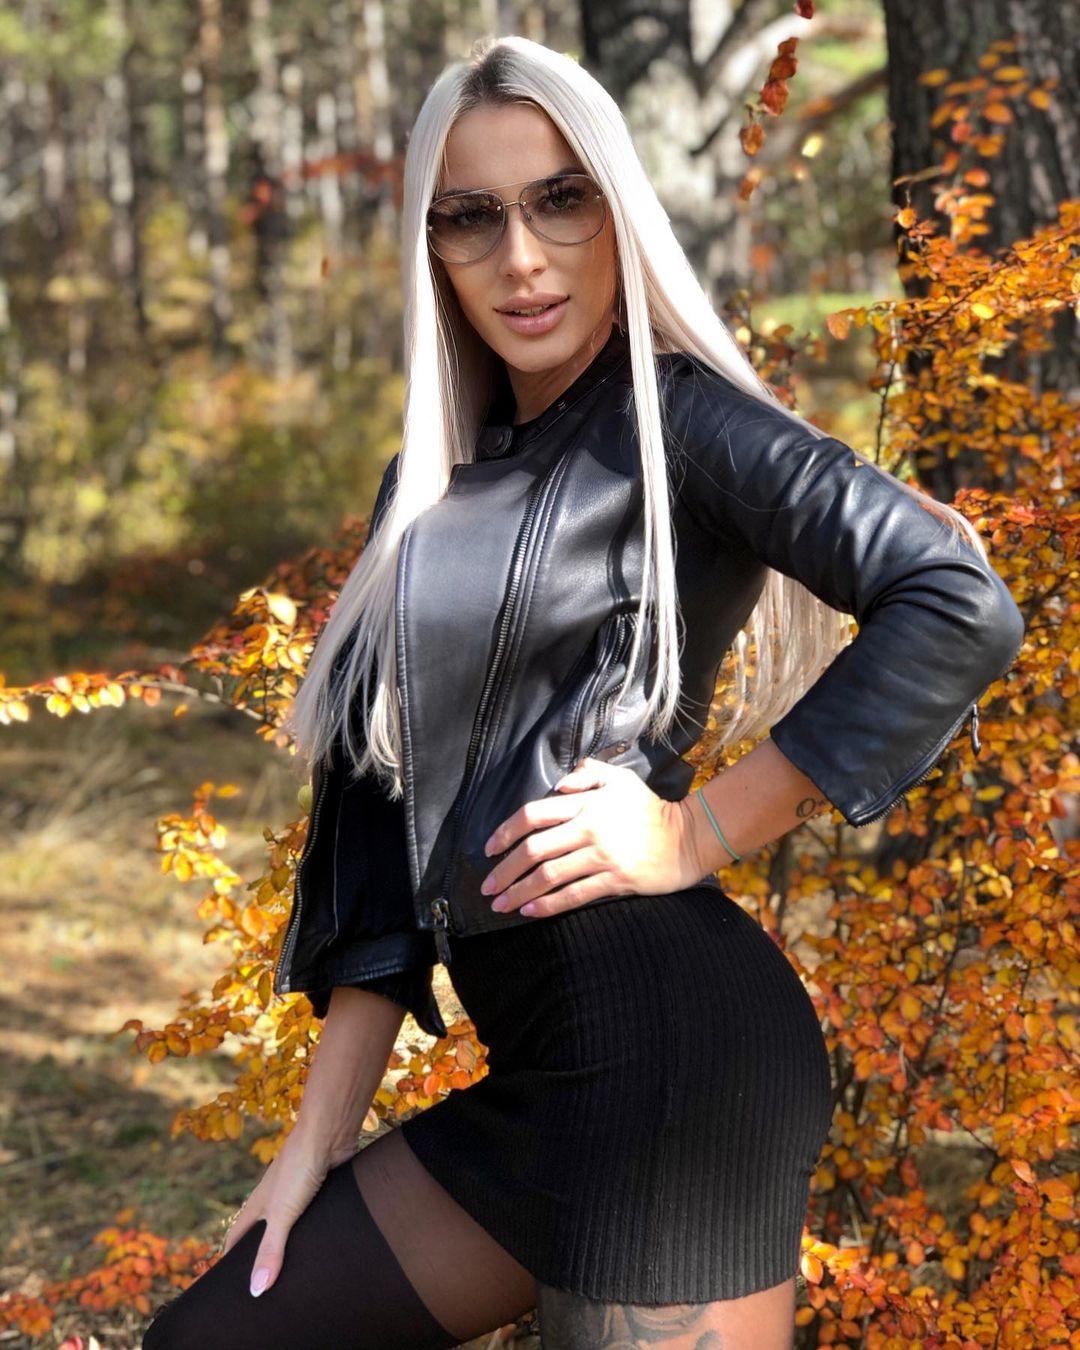 Evgeniya-Alexandrovich-Wallpapers-Insta-Fit-Bio-2